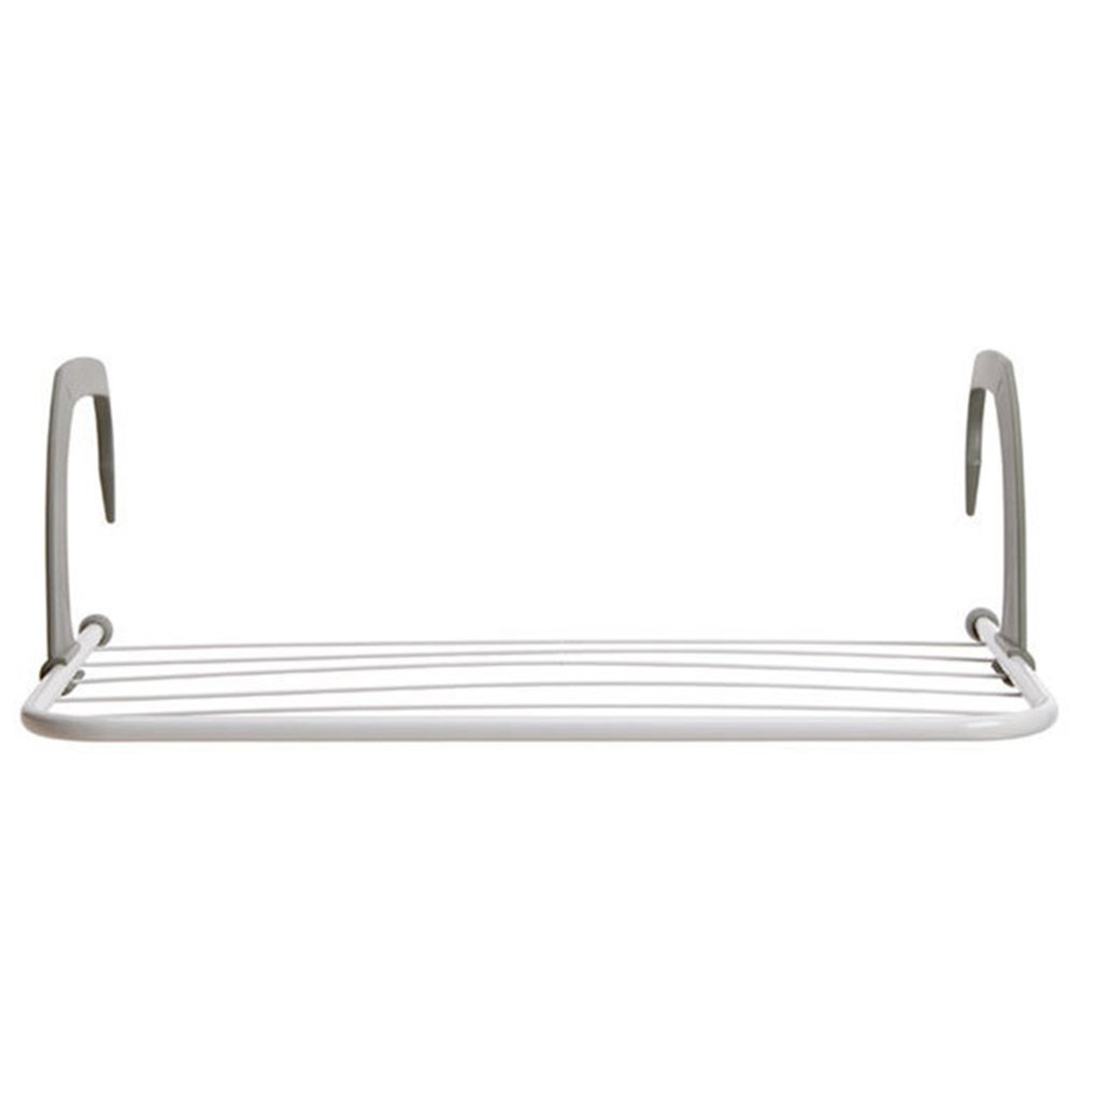 Towel Hanger 5 Bar Metal Portable Radiator Hanger Clothes Dryer Airer Rail